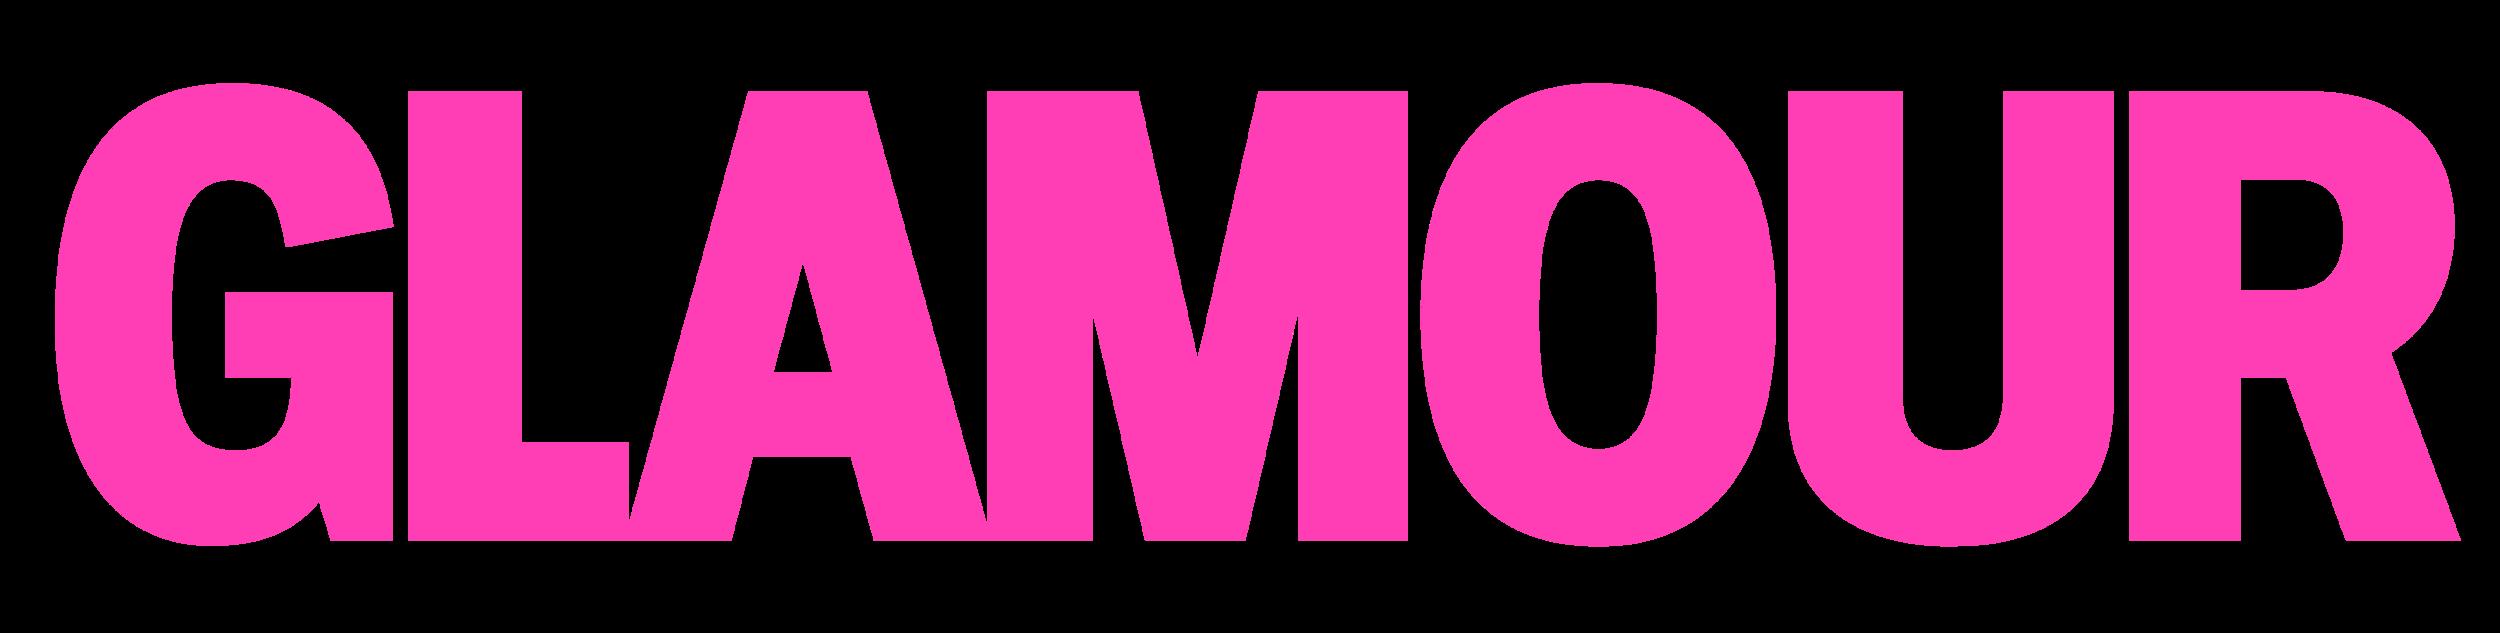 Glamour_logo.png